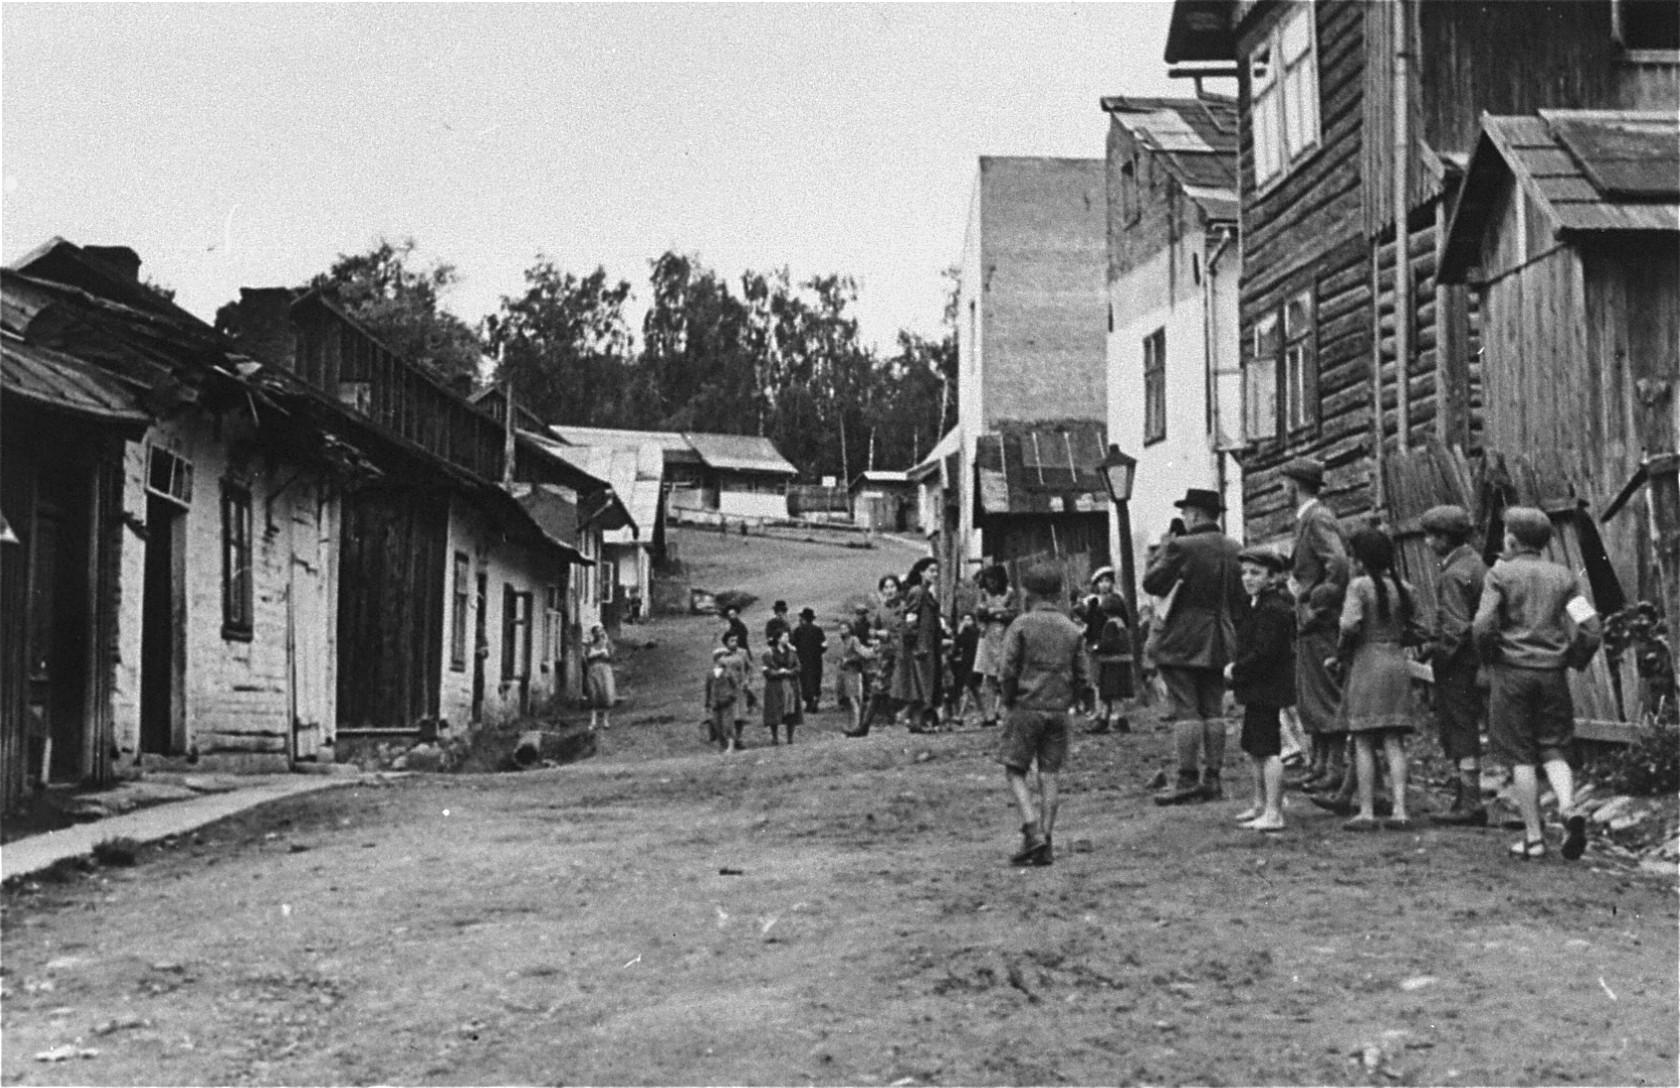 Jewish children walk along an unpaved street in the Frysztak ghetto.